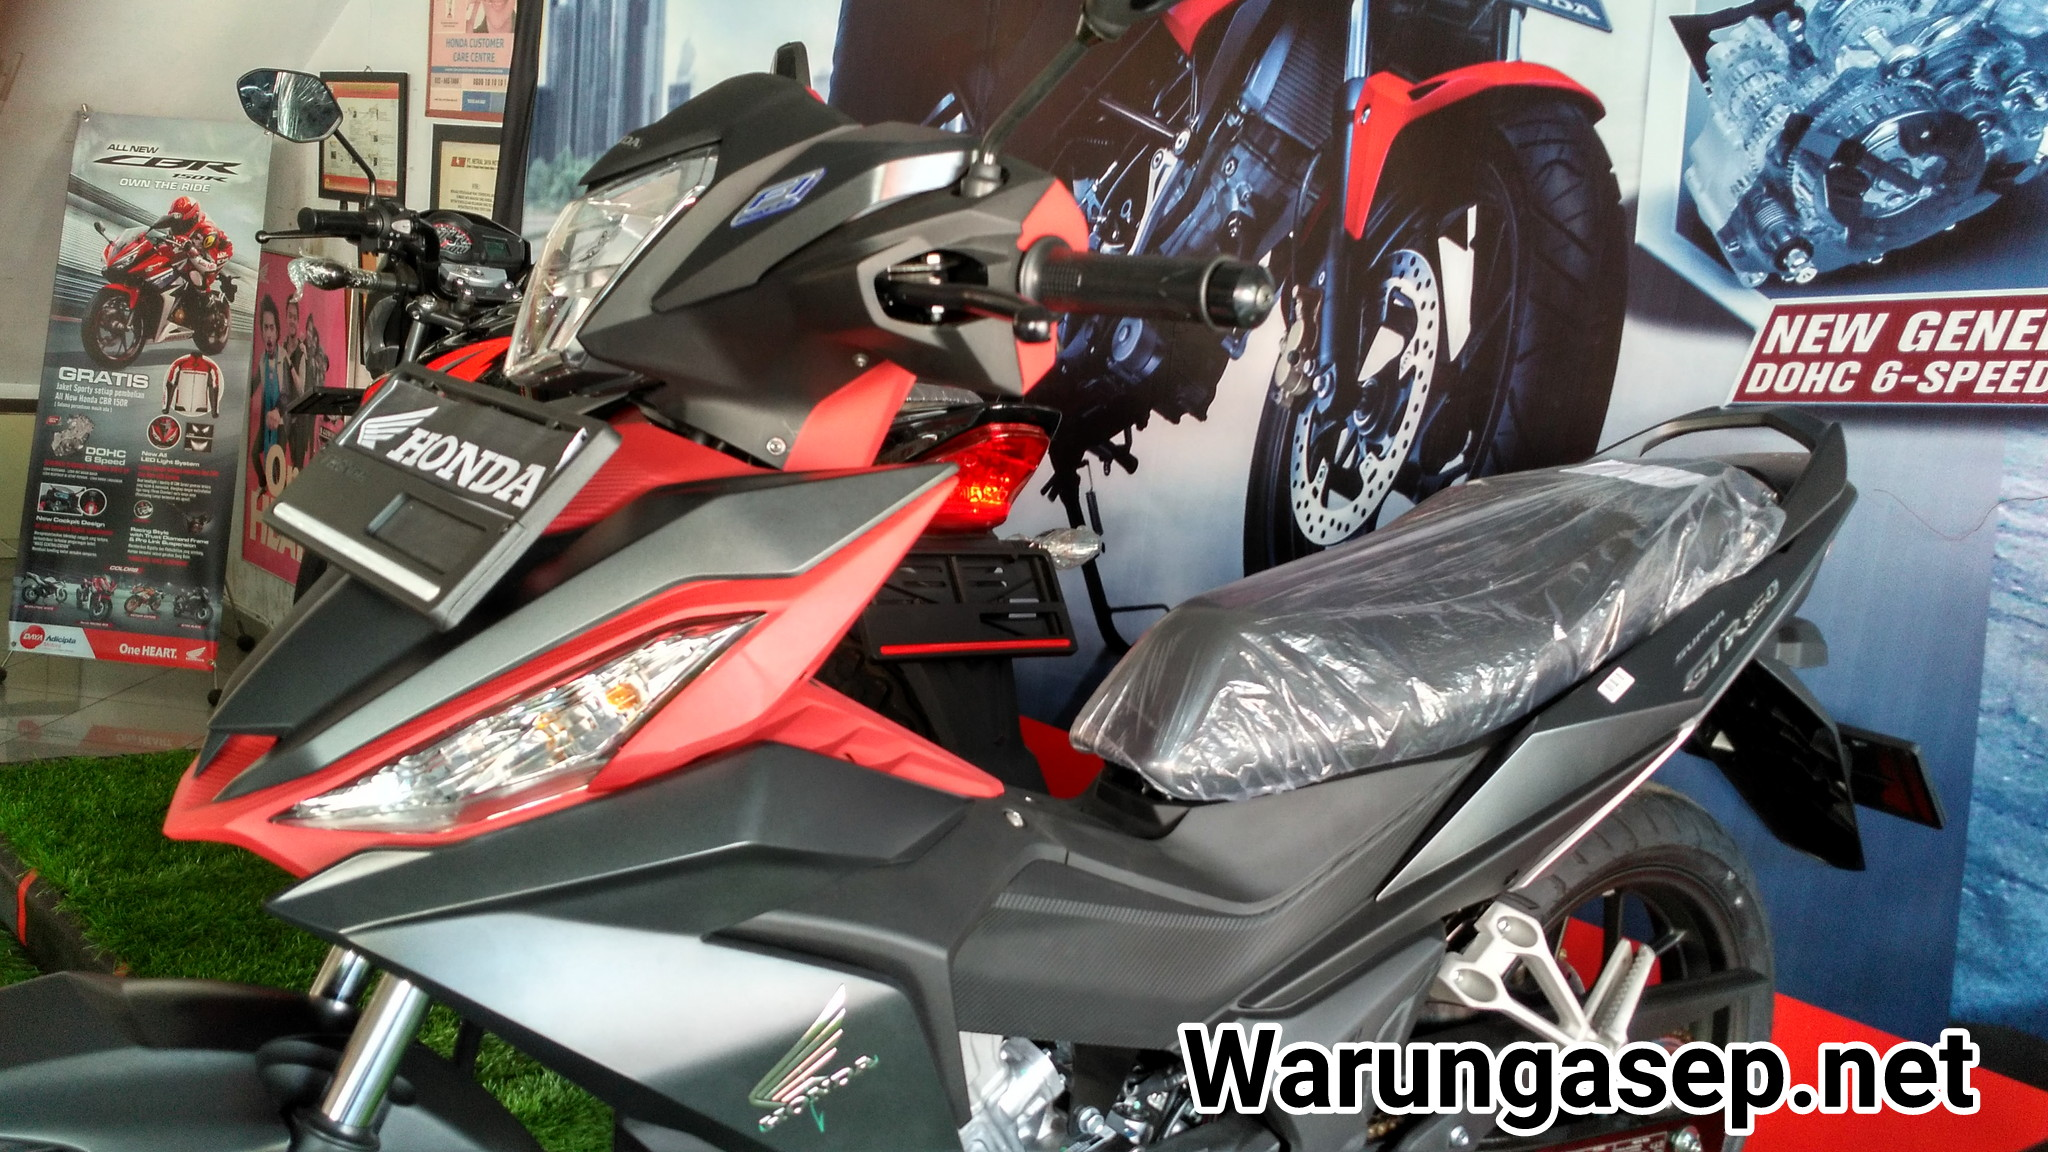 Lihat Lebih Dekat Honda Supra GTR 150 Warna Hitam Doff Exlusive Gun